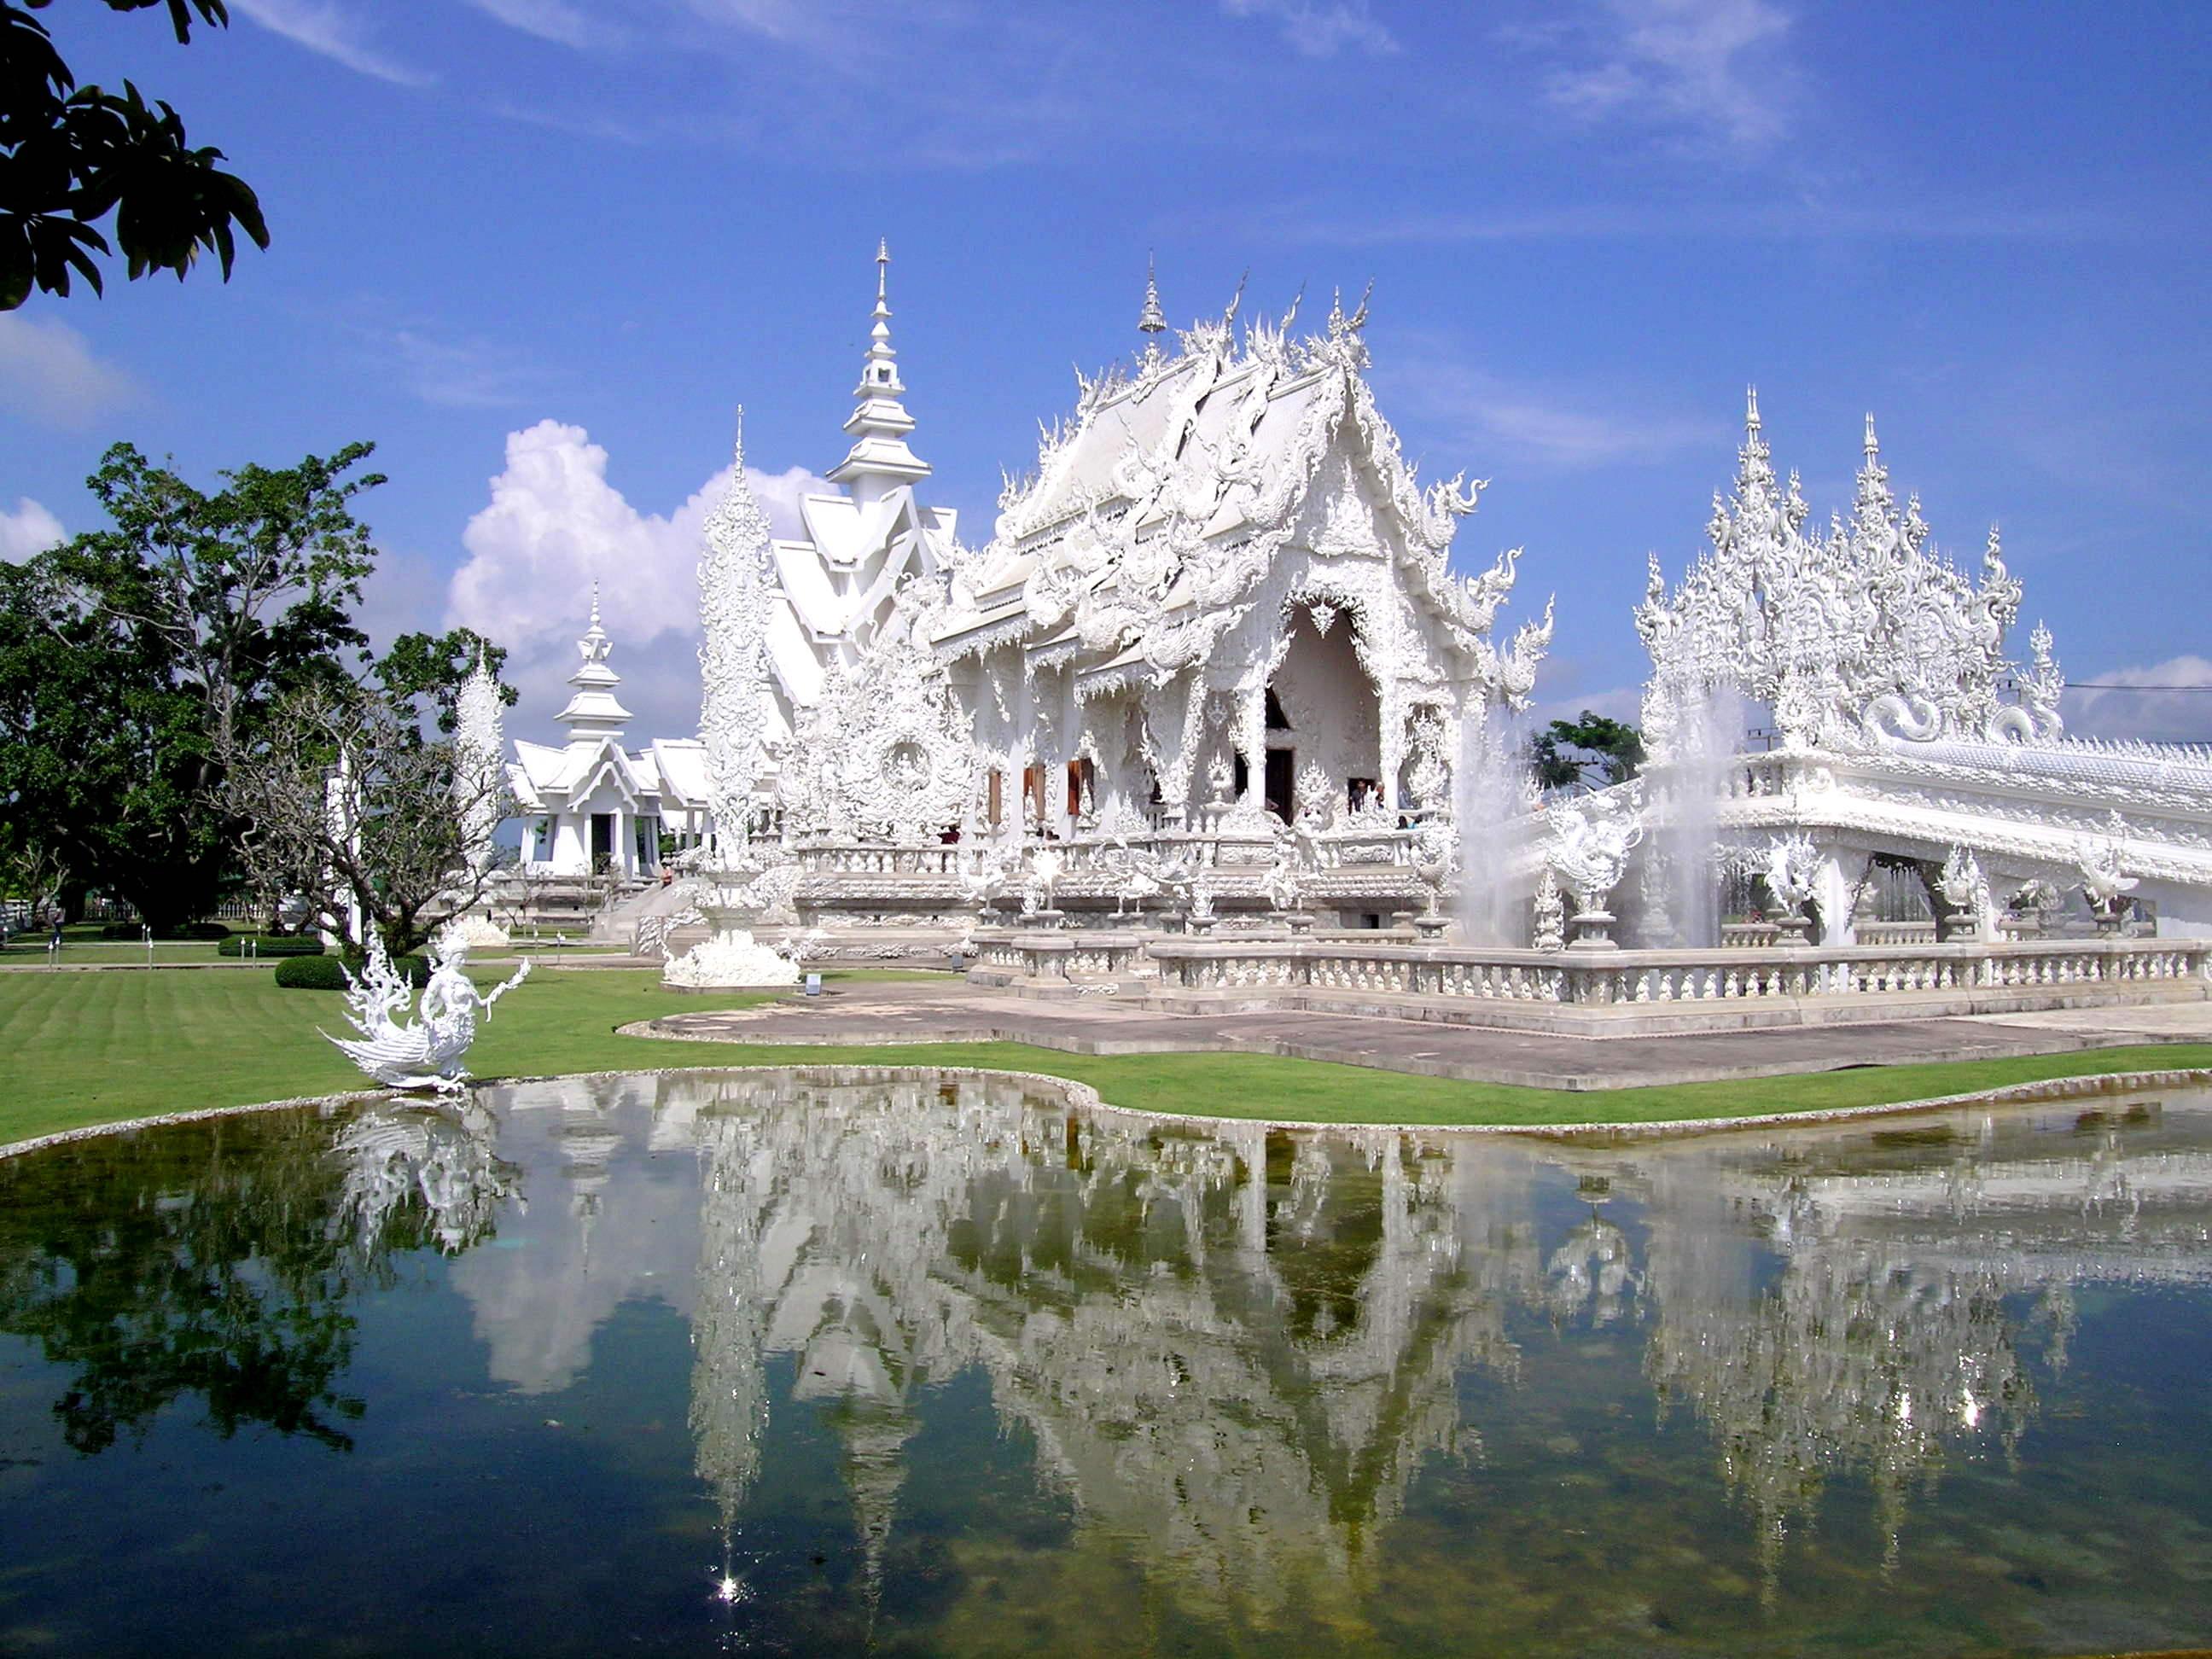 Chiang Mai www.theinternettraveller.com